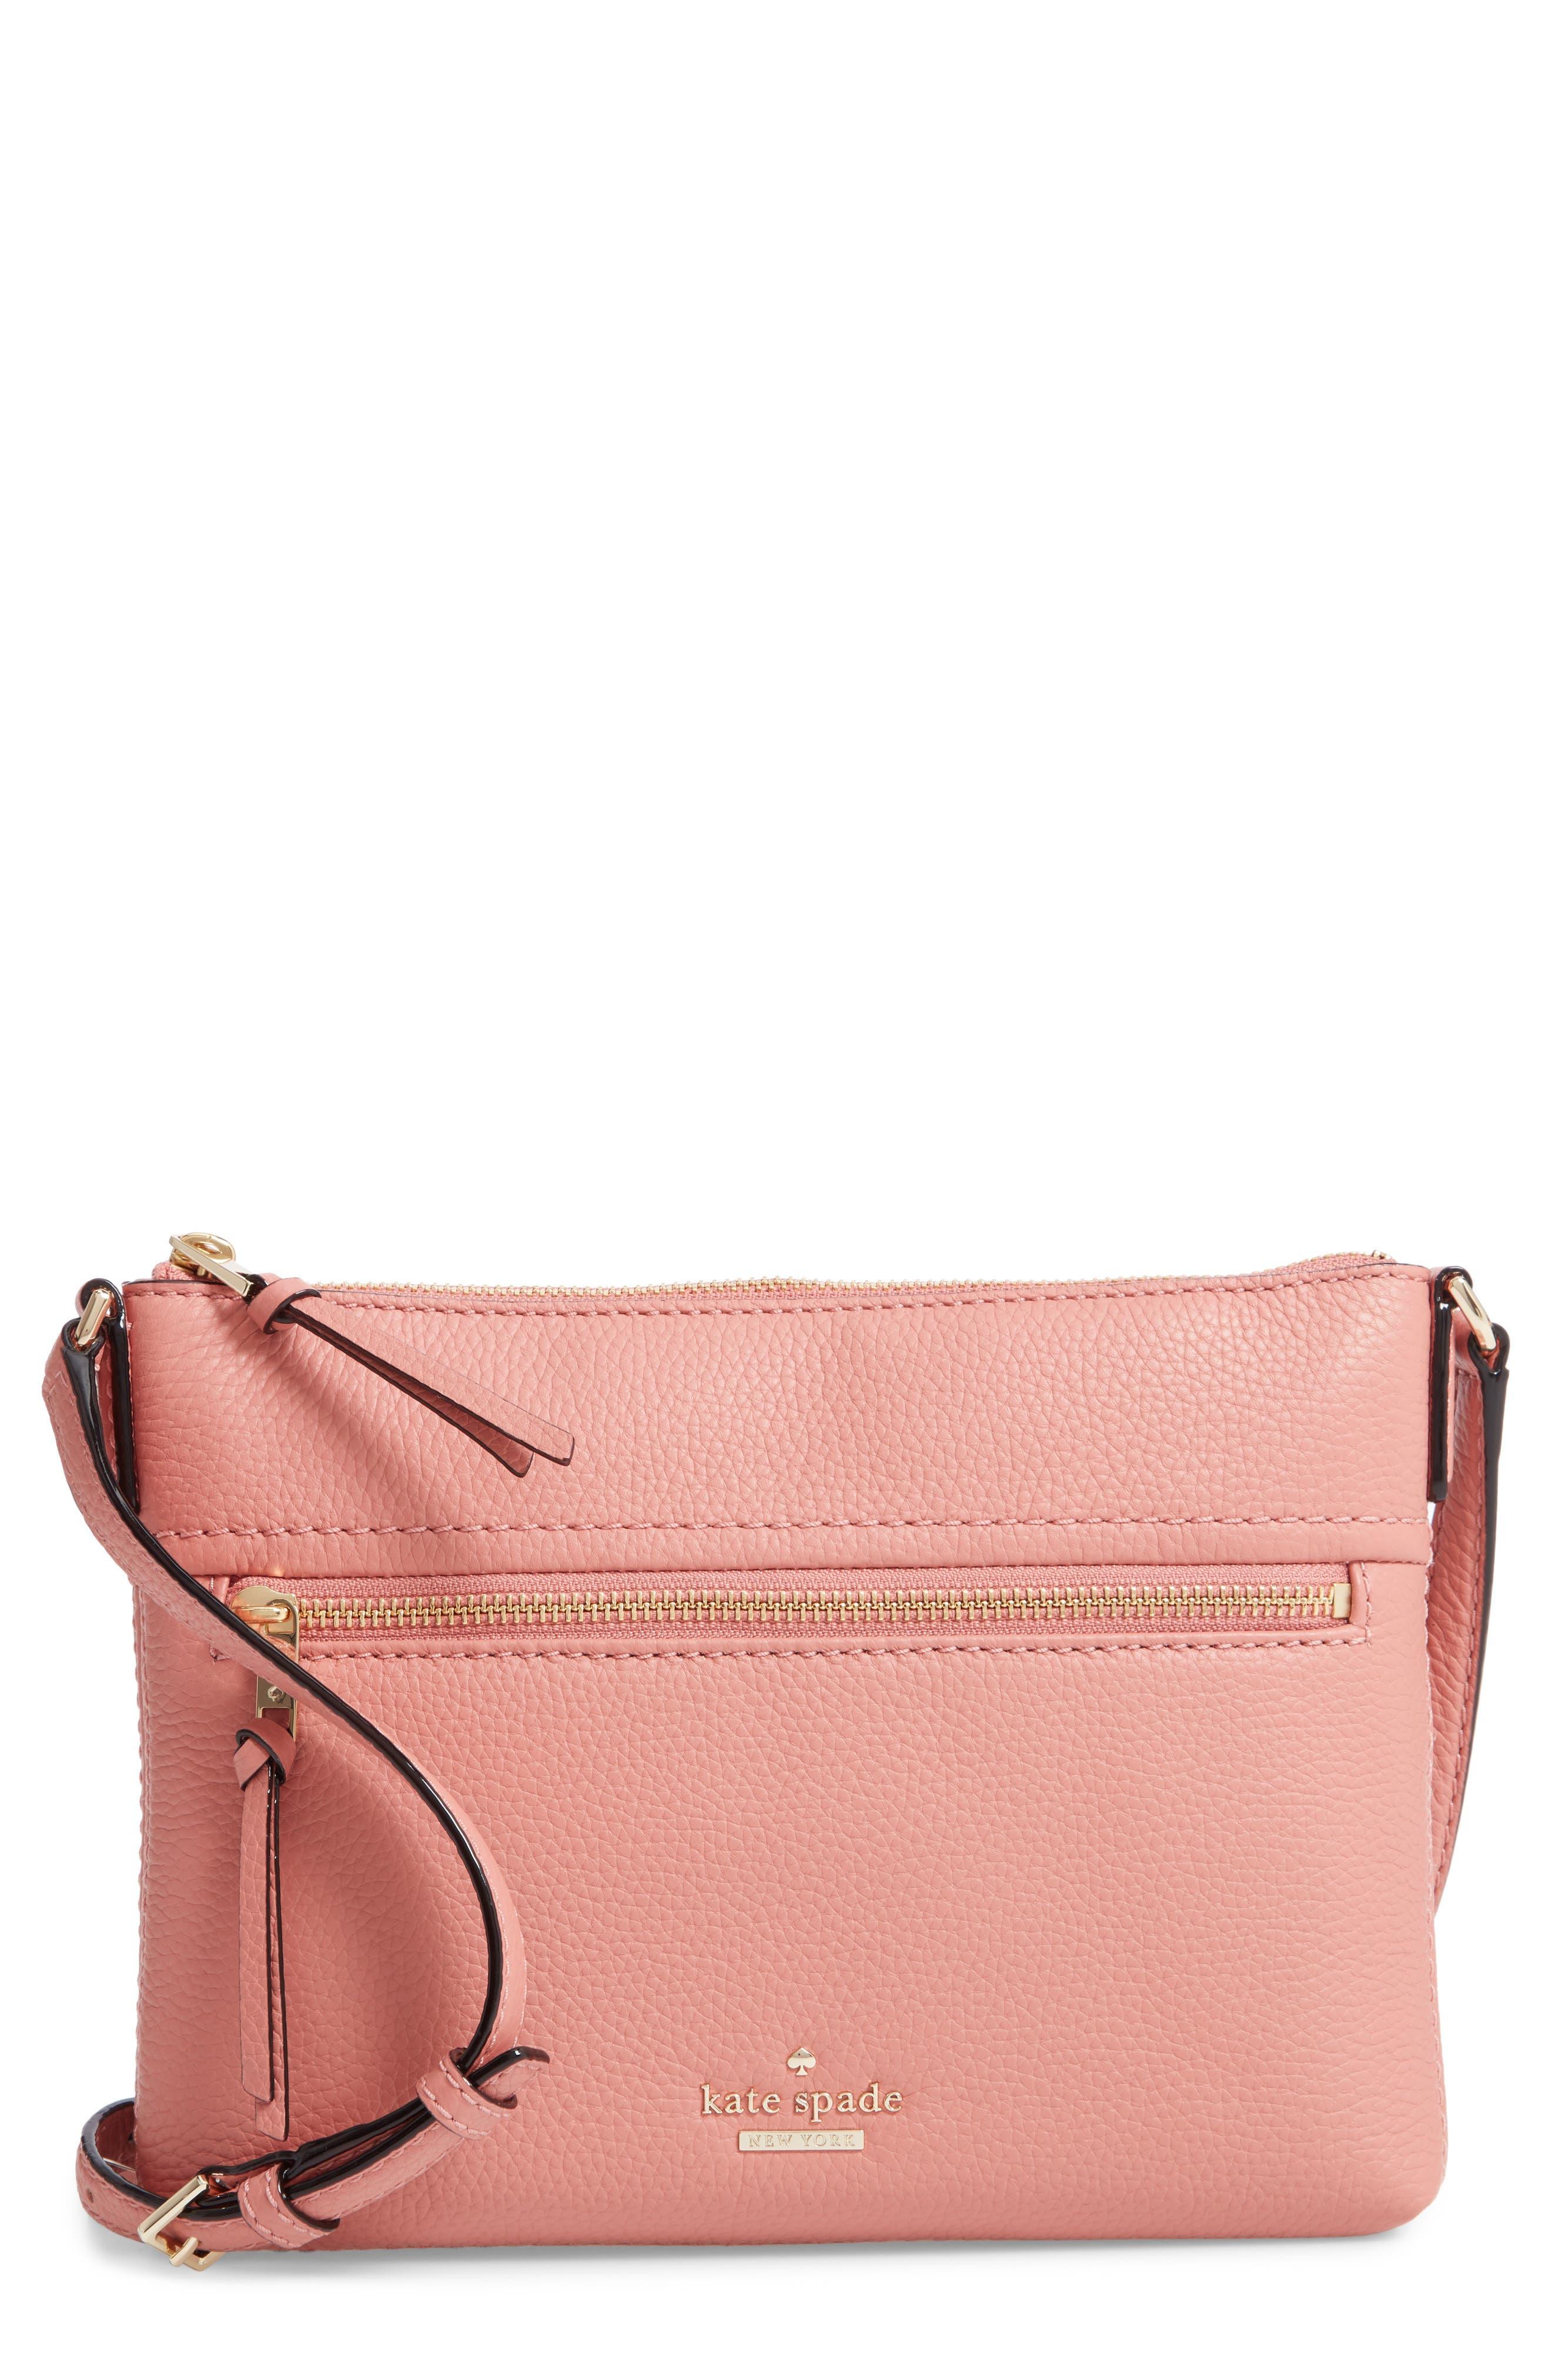 Kate Spade New York Crossbody Bags Nordstrom Hayden Pink